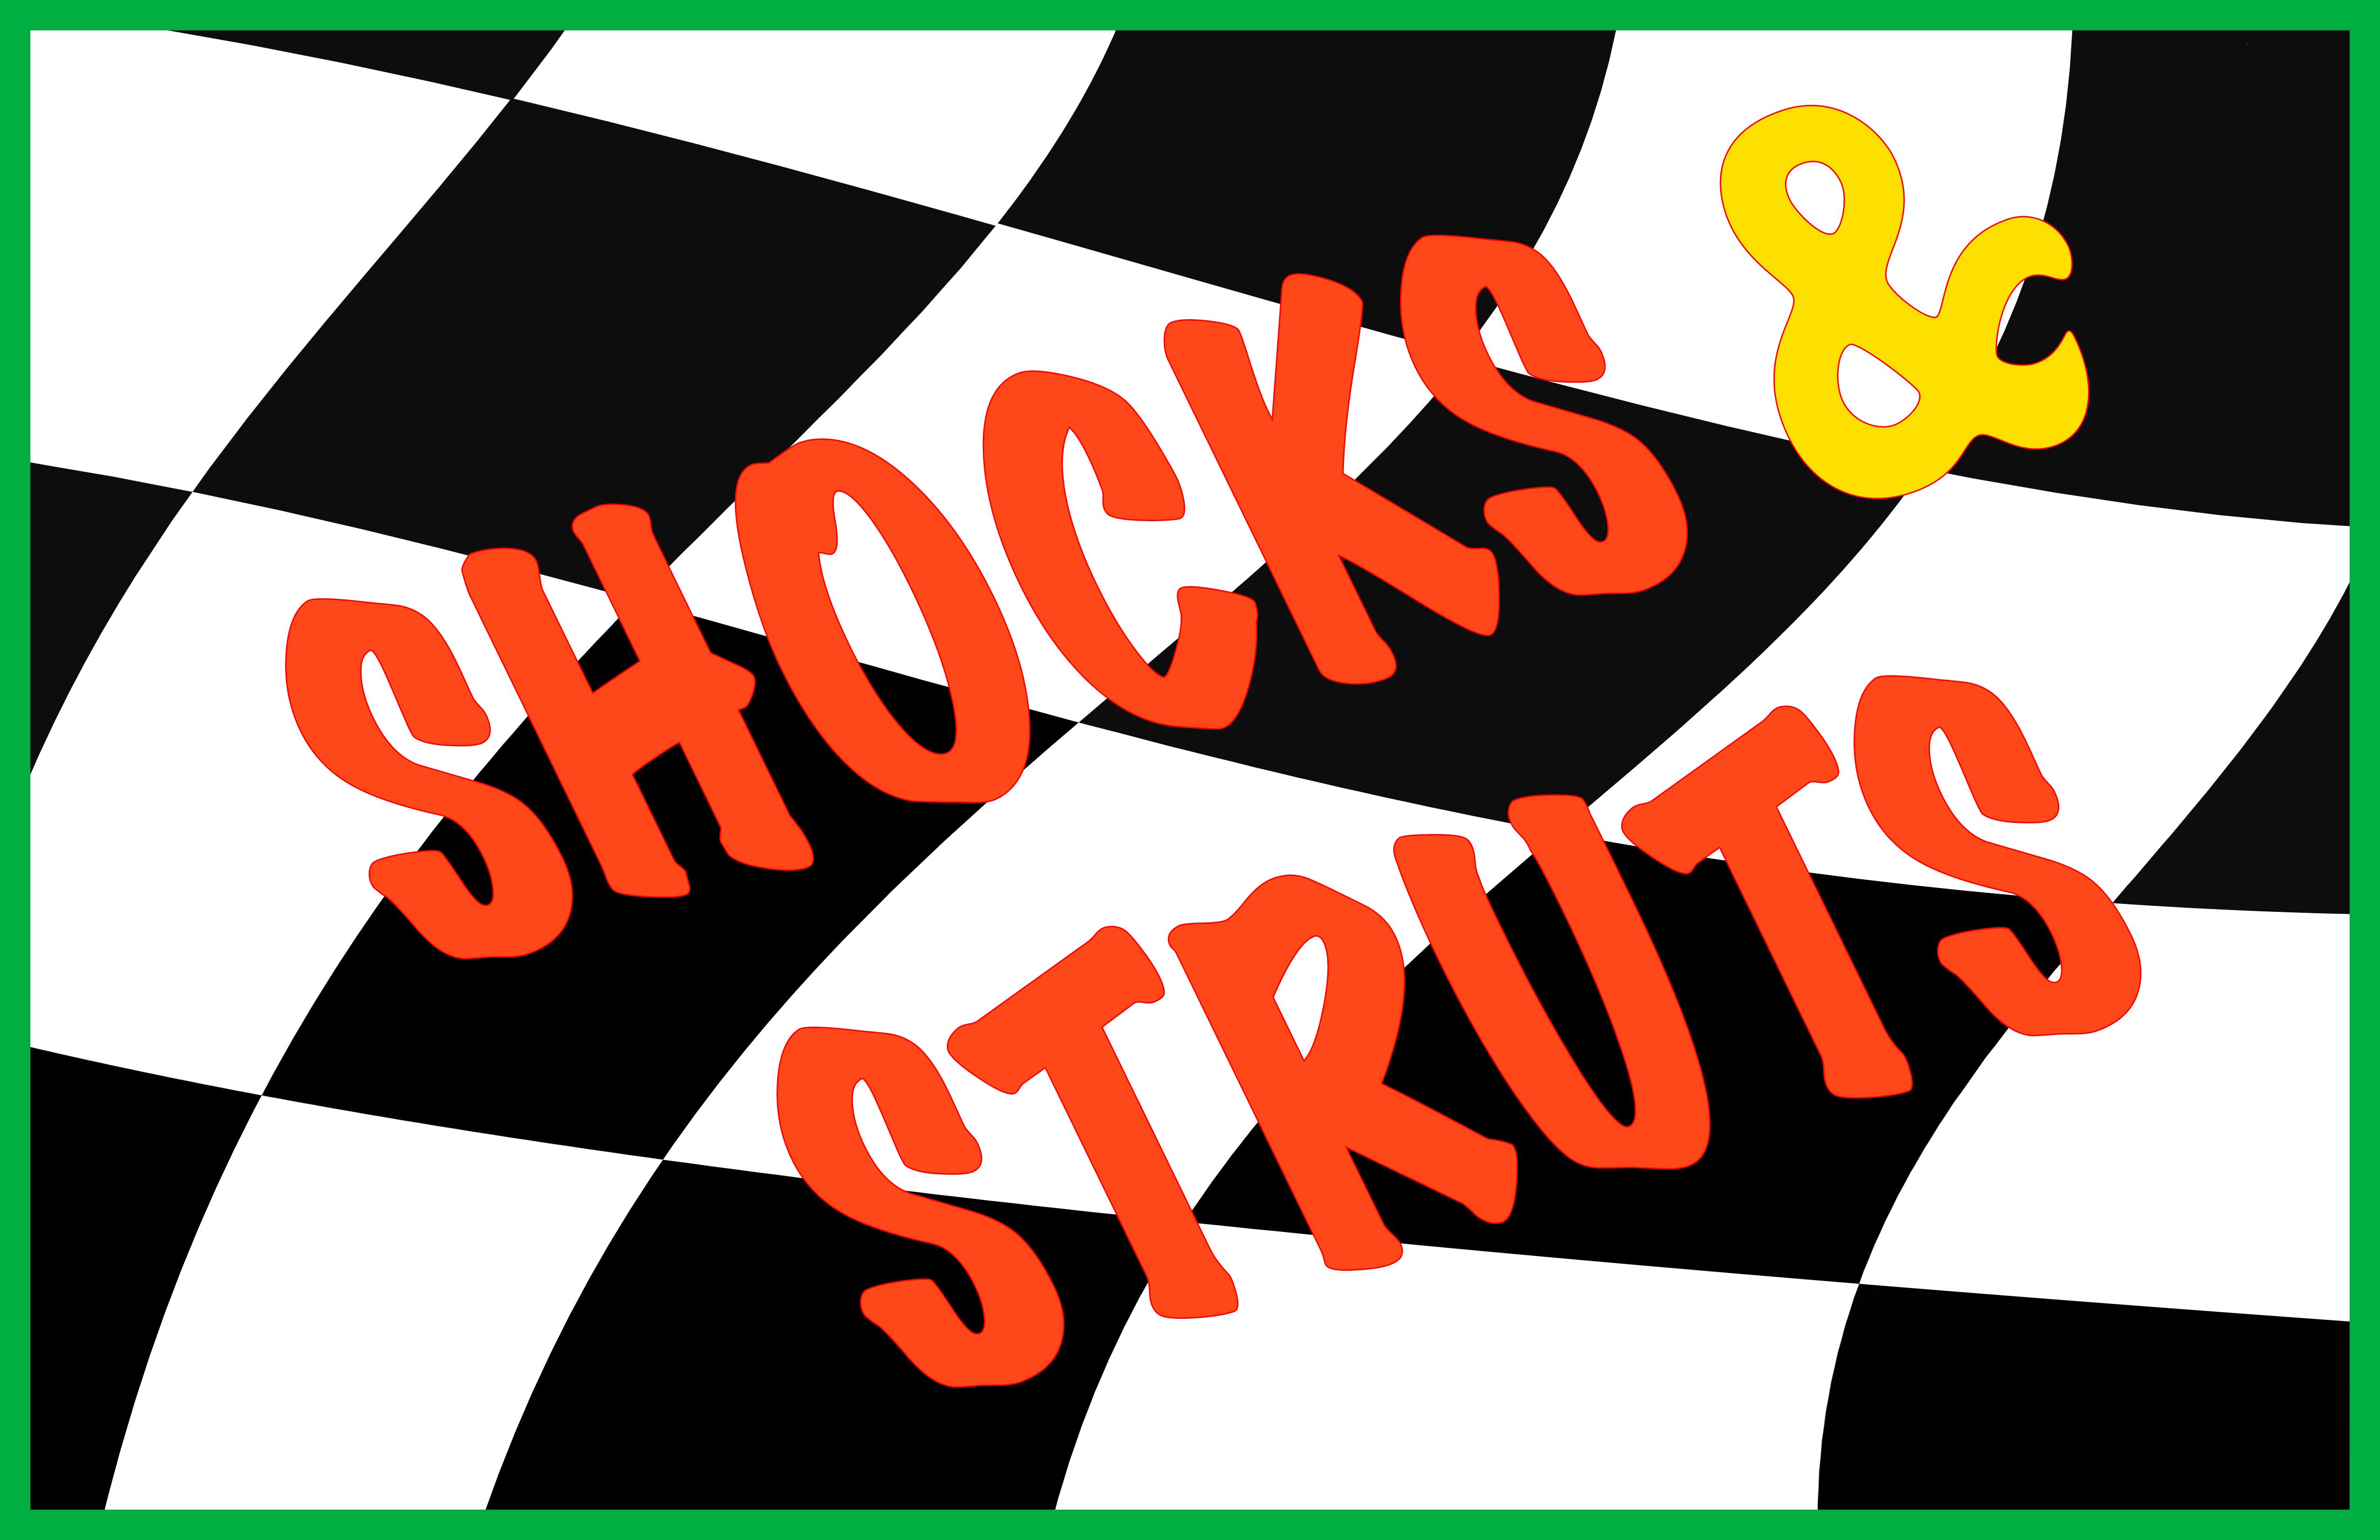 Shocks & Struts